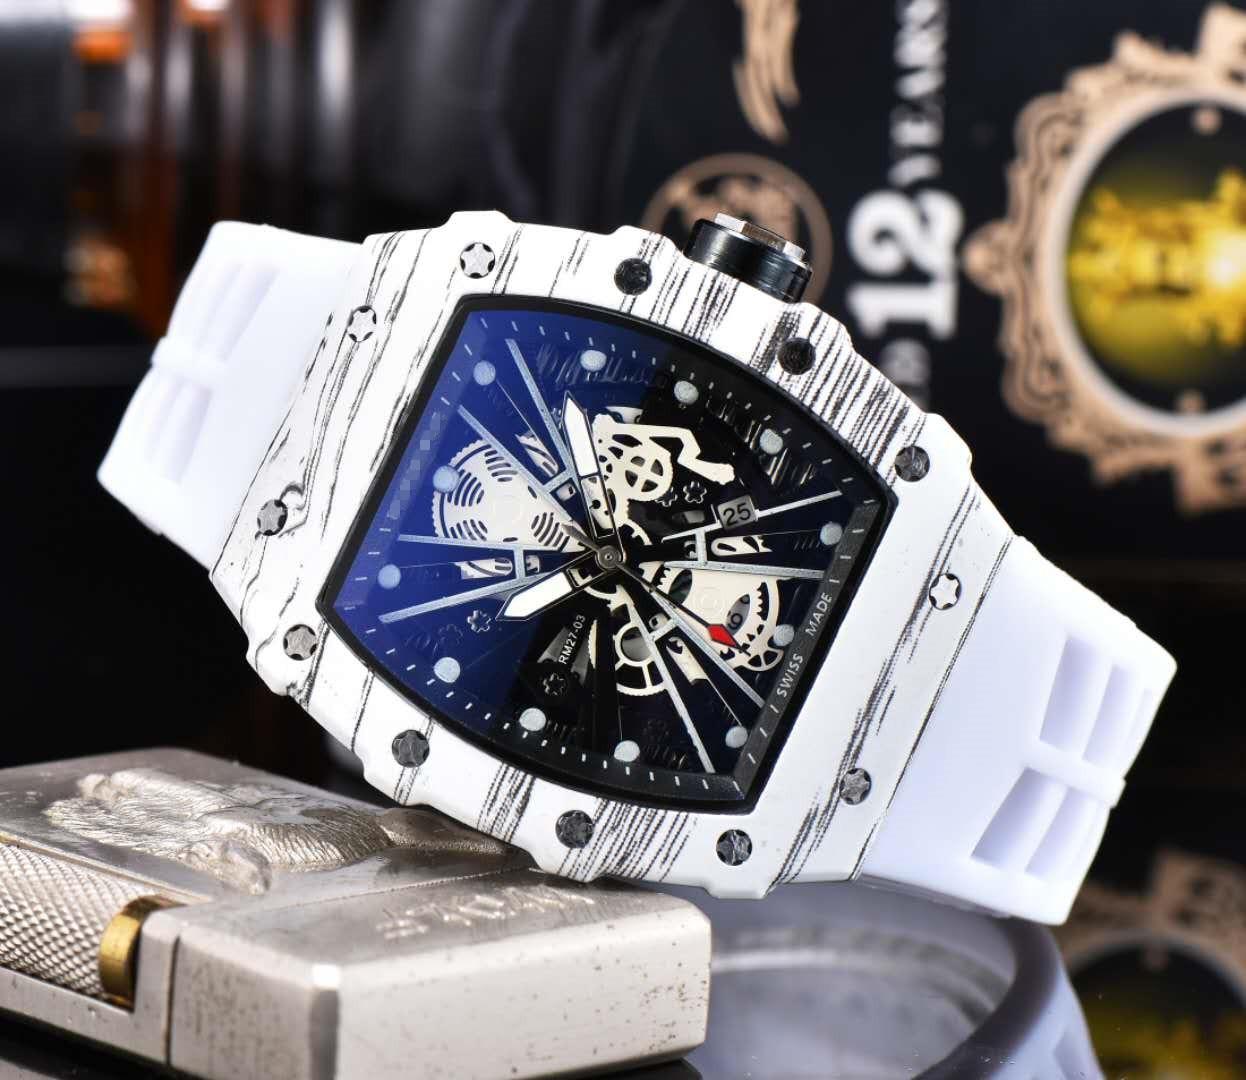 Trendy Men's Watch RM Richard Luxury Quartz Watches Top Brand Mille Mens Watch Designer Wristwacth Water Resistant Reloj Hombre